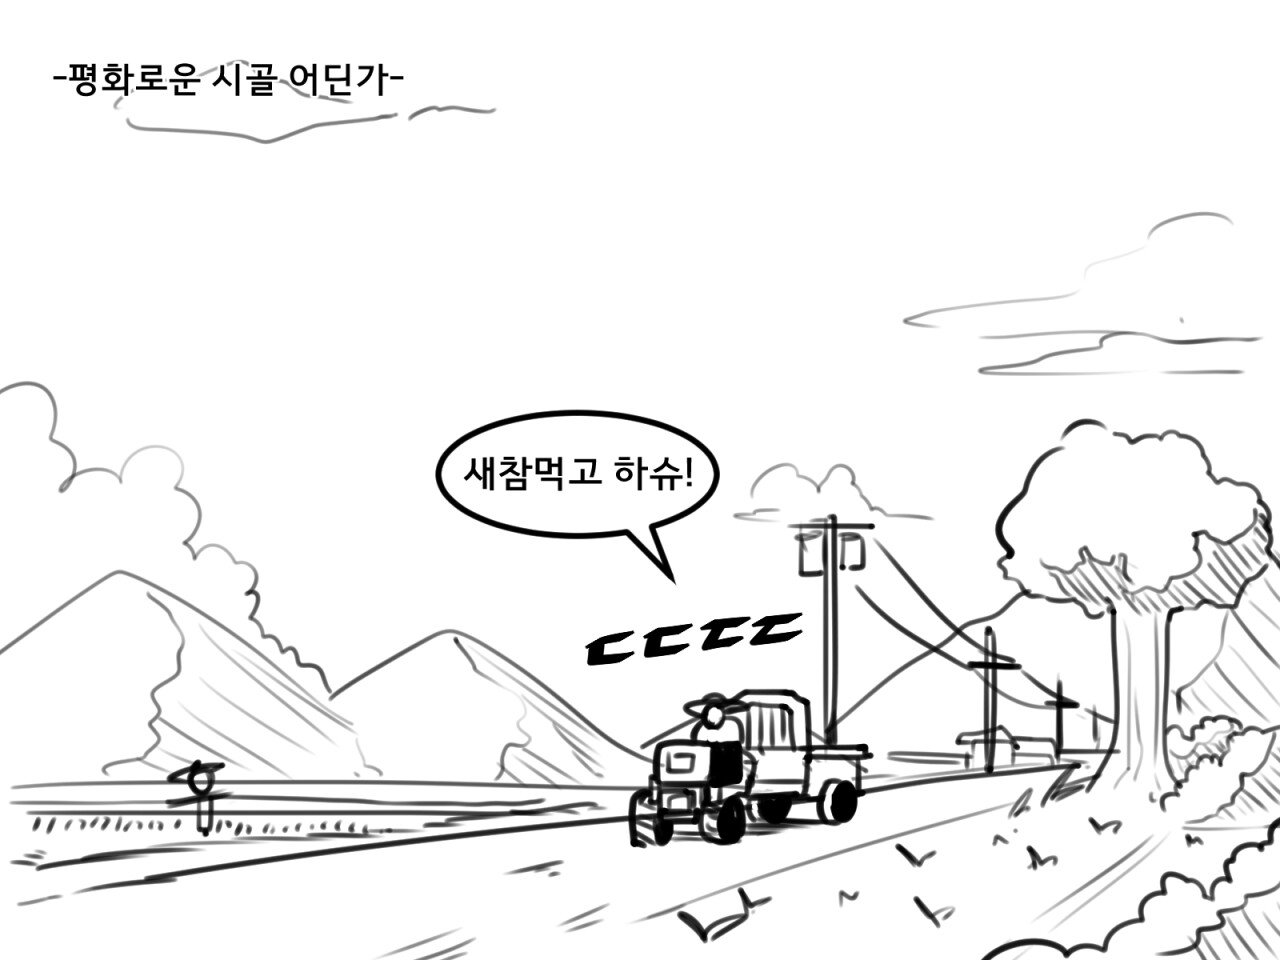 cartoon-20200407-235825-000.jpg ㅇㅎ) 우유 만드는 법.manhwa